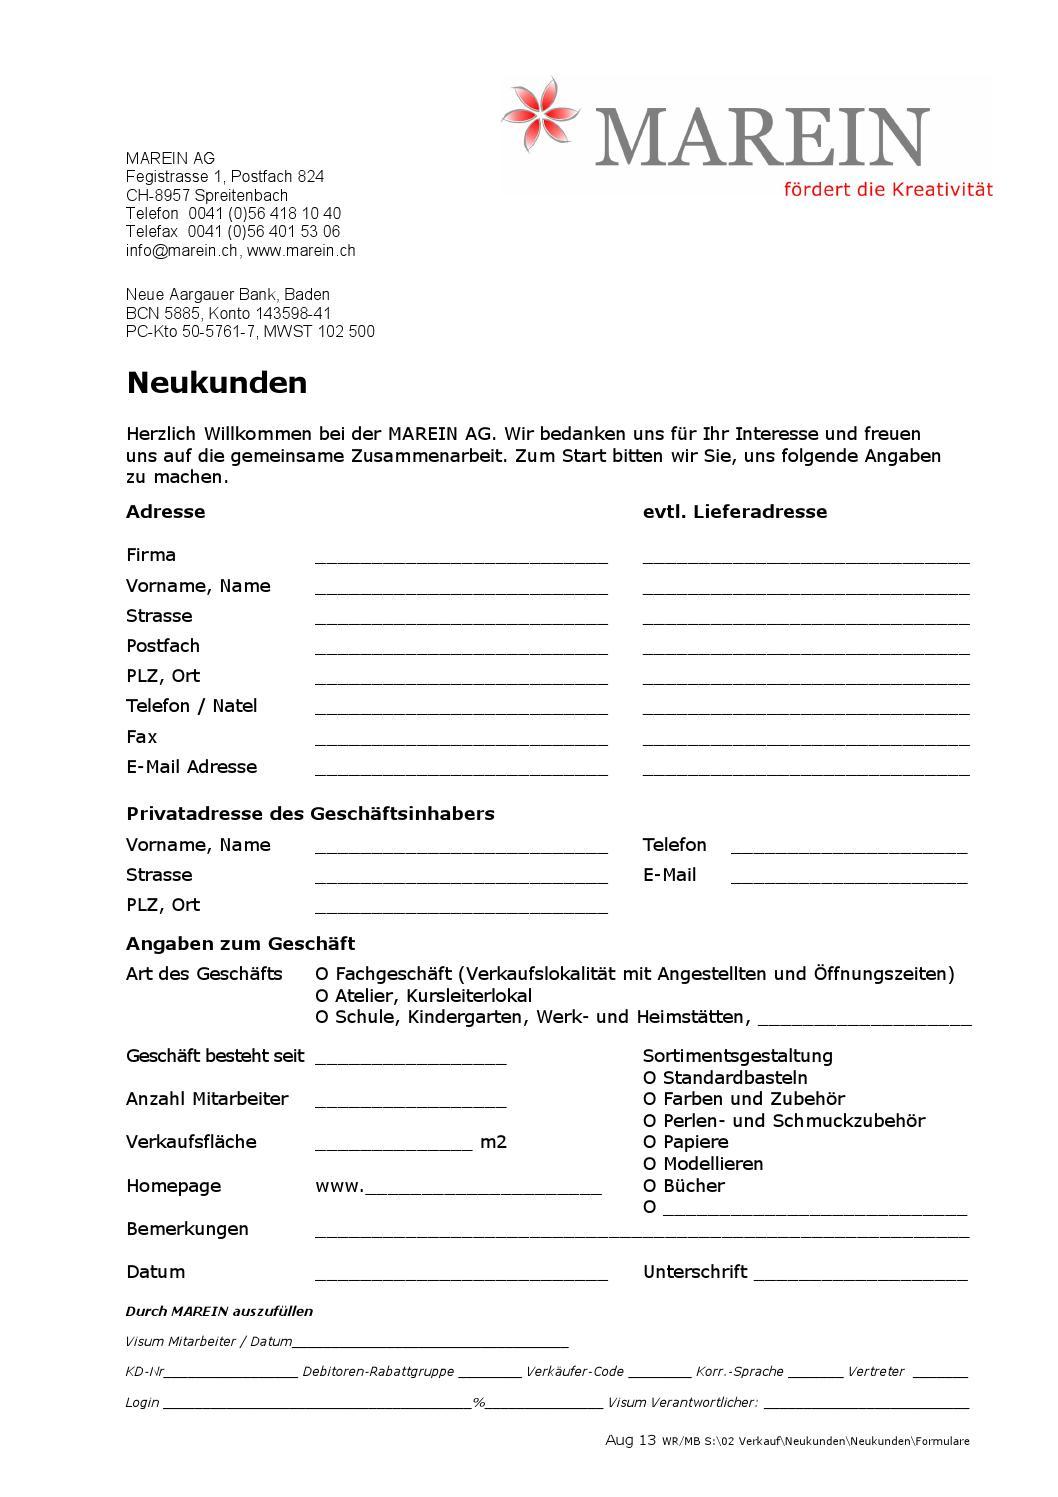 Neukunden aufnahme formular neu by I AM CREATIVE - issuu